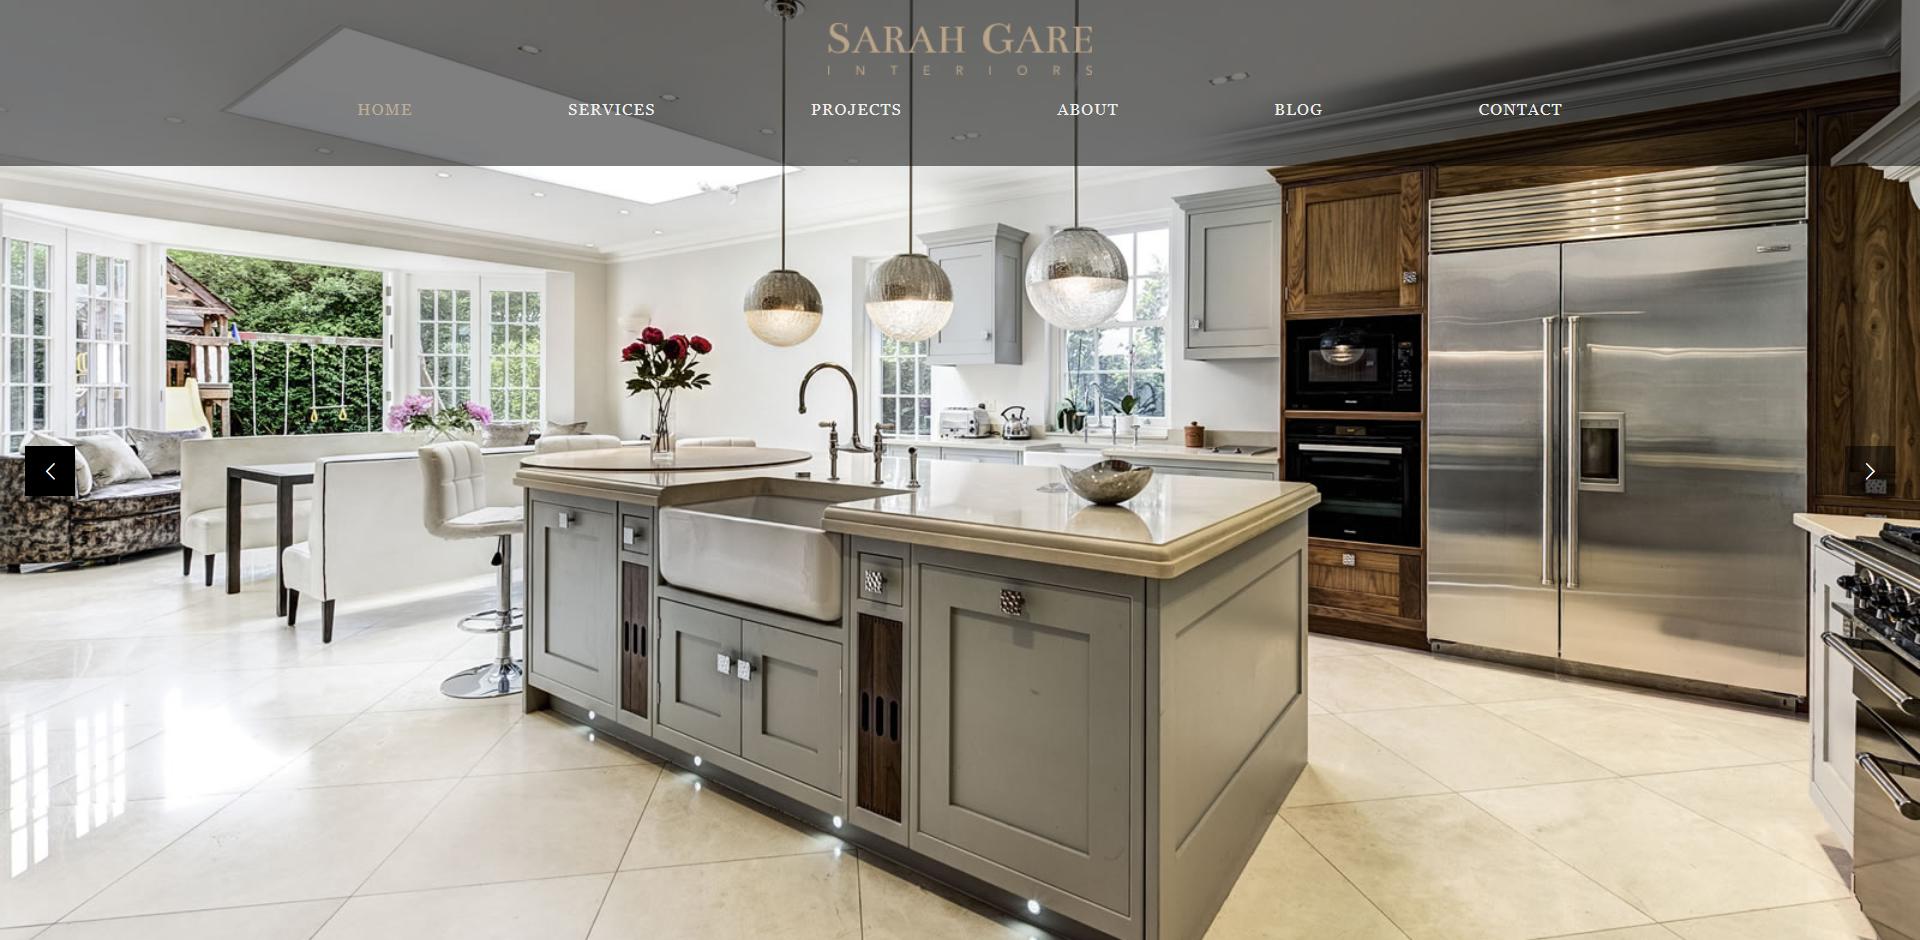 Sarah Gare interiors homepage